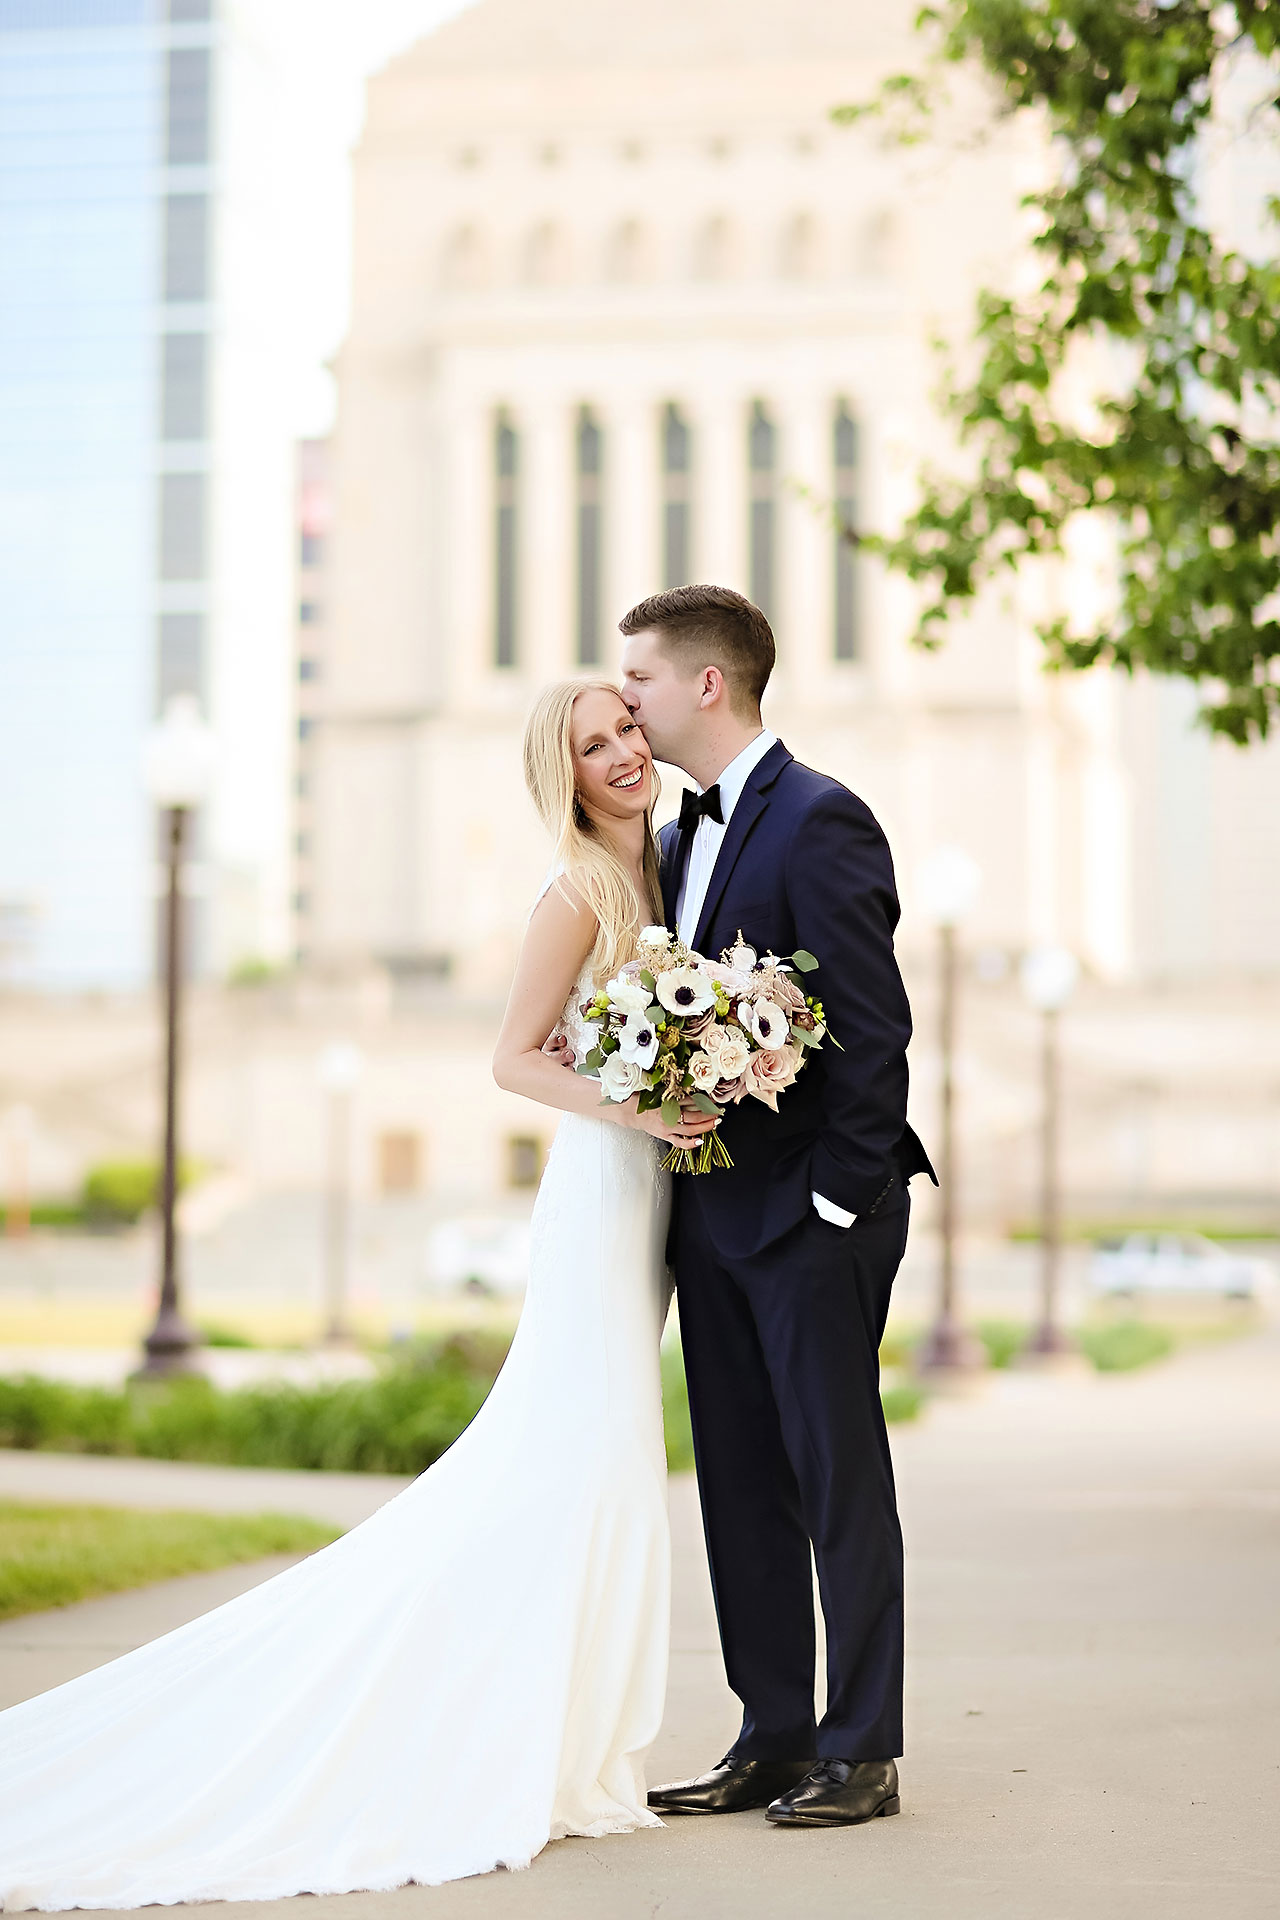 Molly Declan Scottish Rite Indianapolis Wedding 149